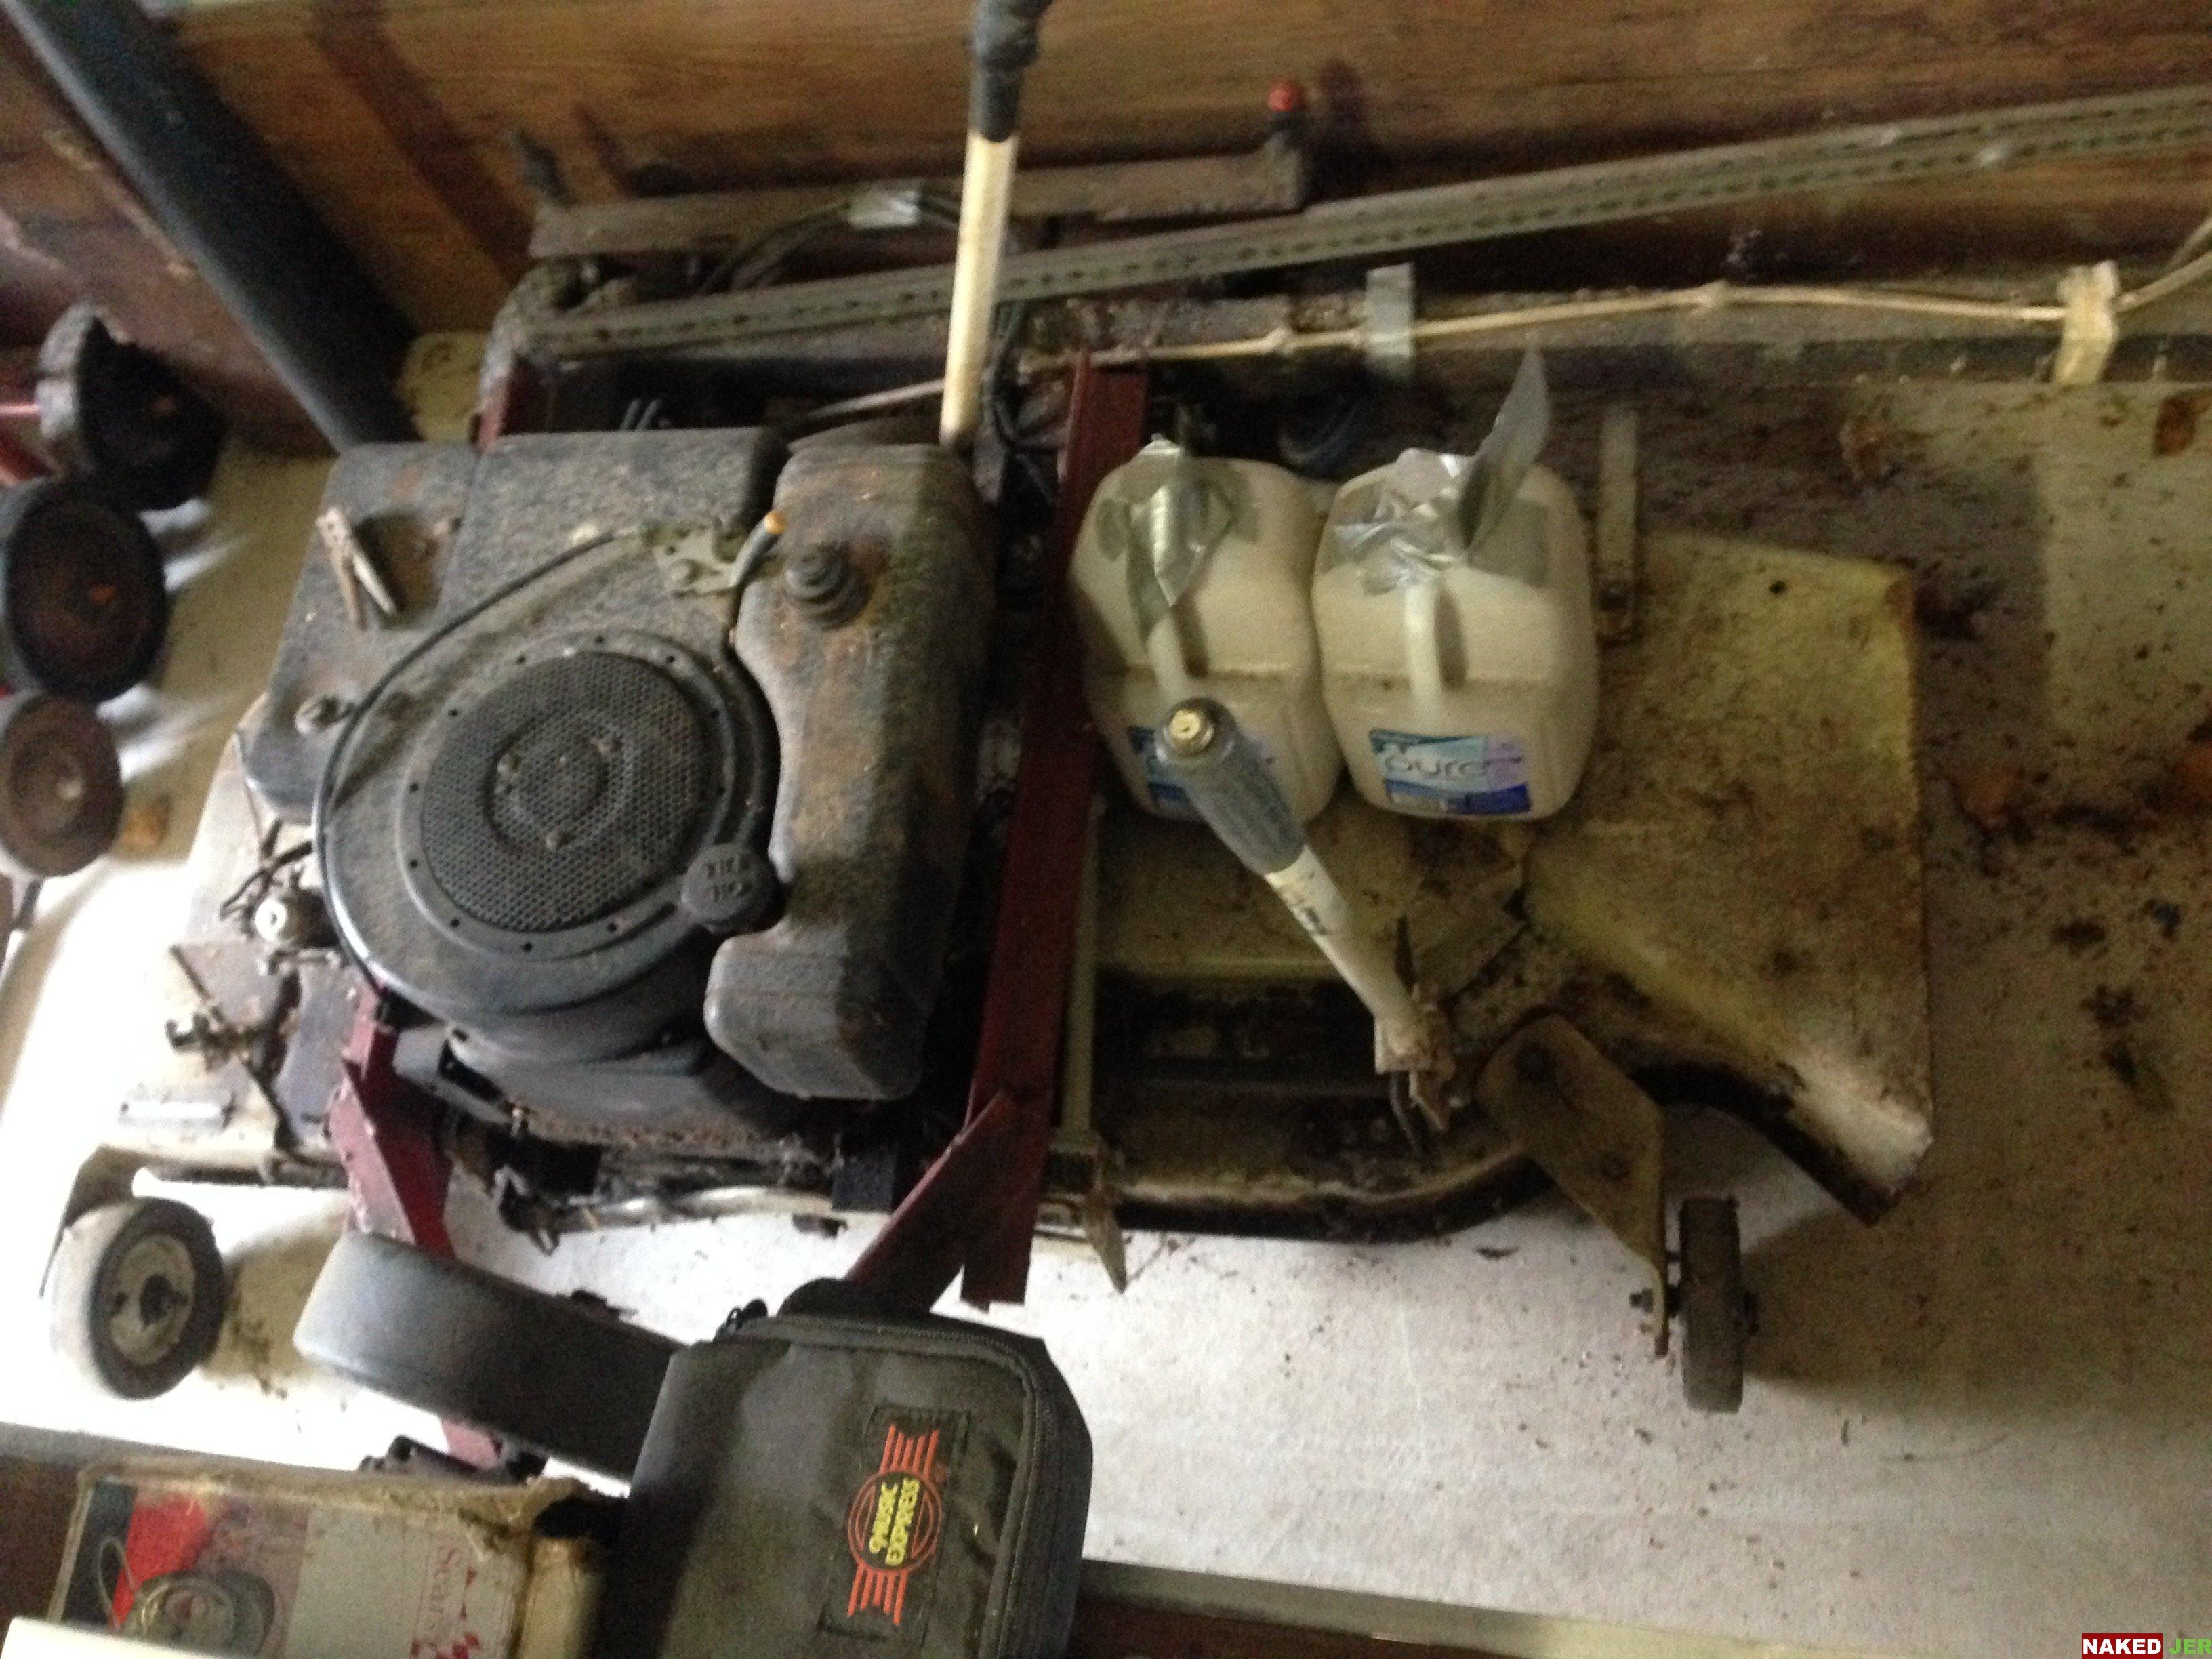 Drag behind mower deck and engine $75